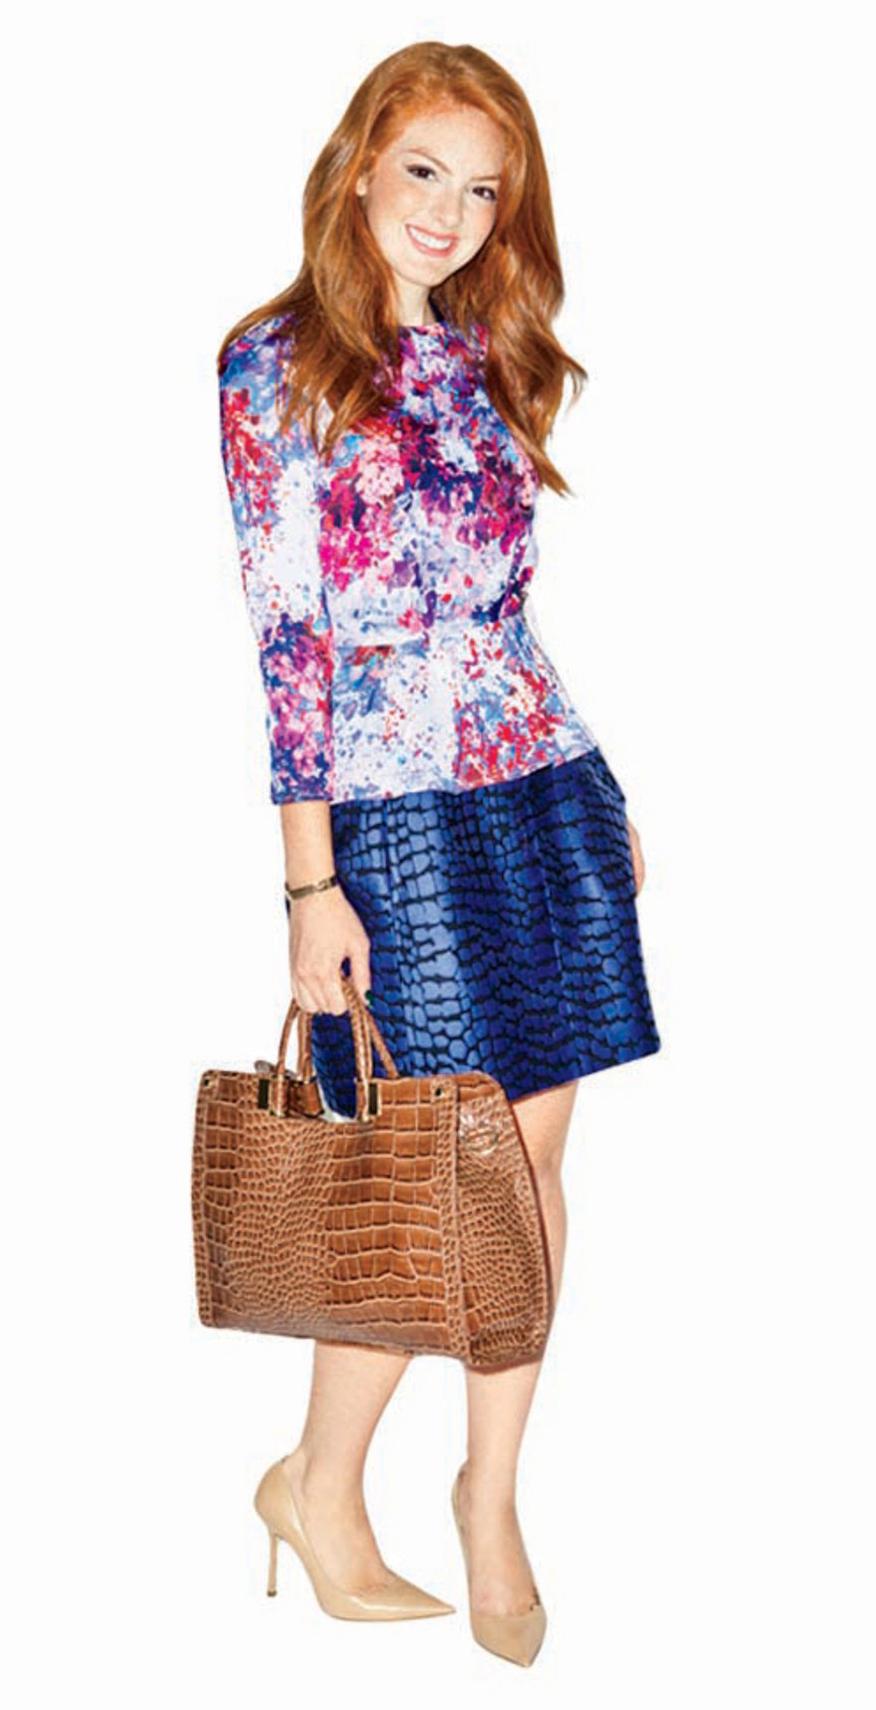 blue-navy-mini-skirt-r-pink-magenta-top-print-cognac-bag-tote-tan-shoe-pumps-howtowear-fashion-style-outfit-spring-summer-hairr-work.jpg